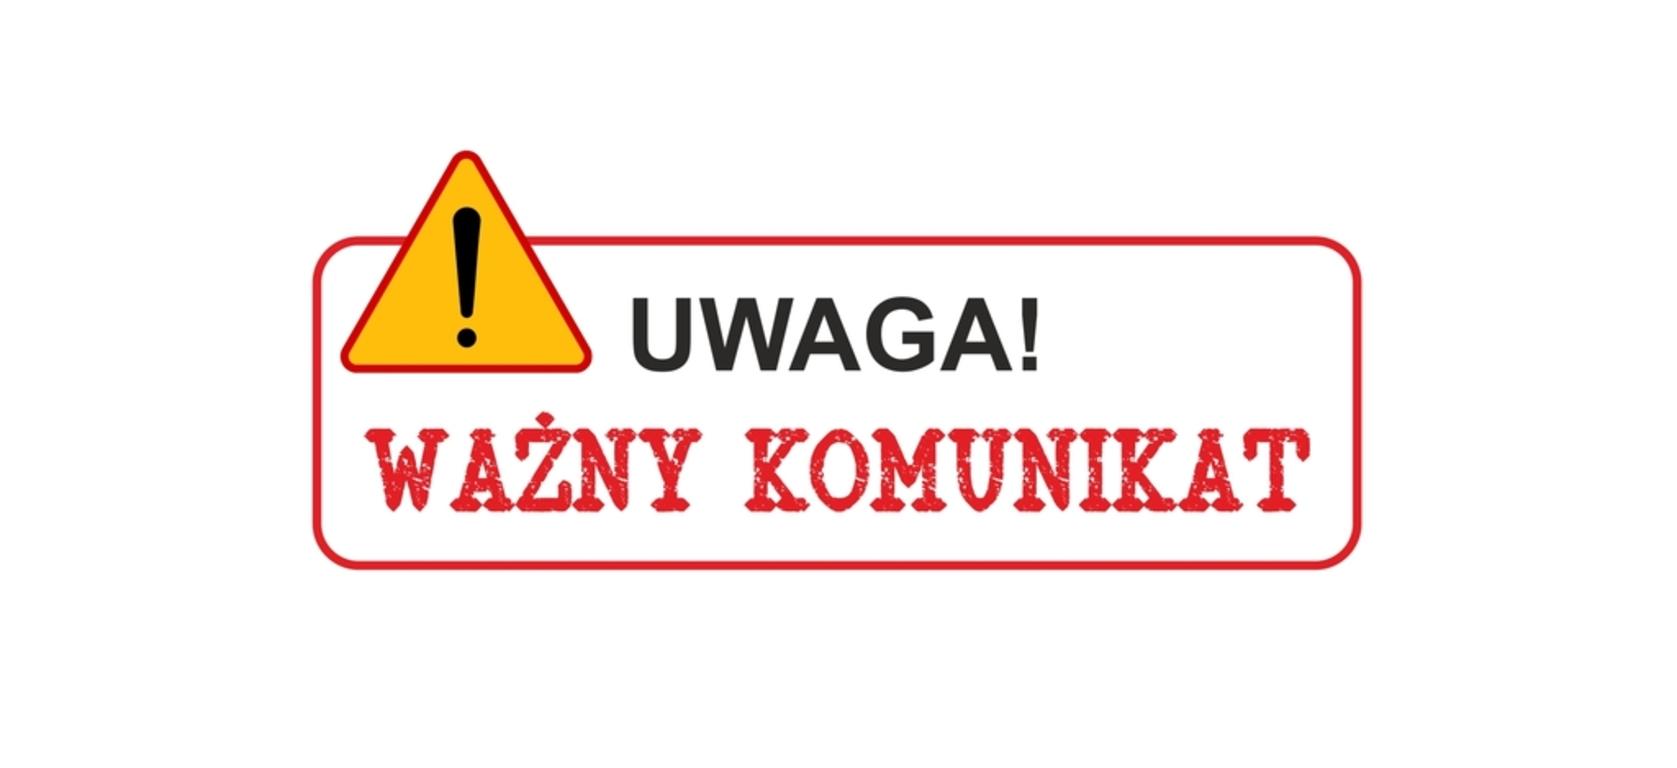 UWAGA 1